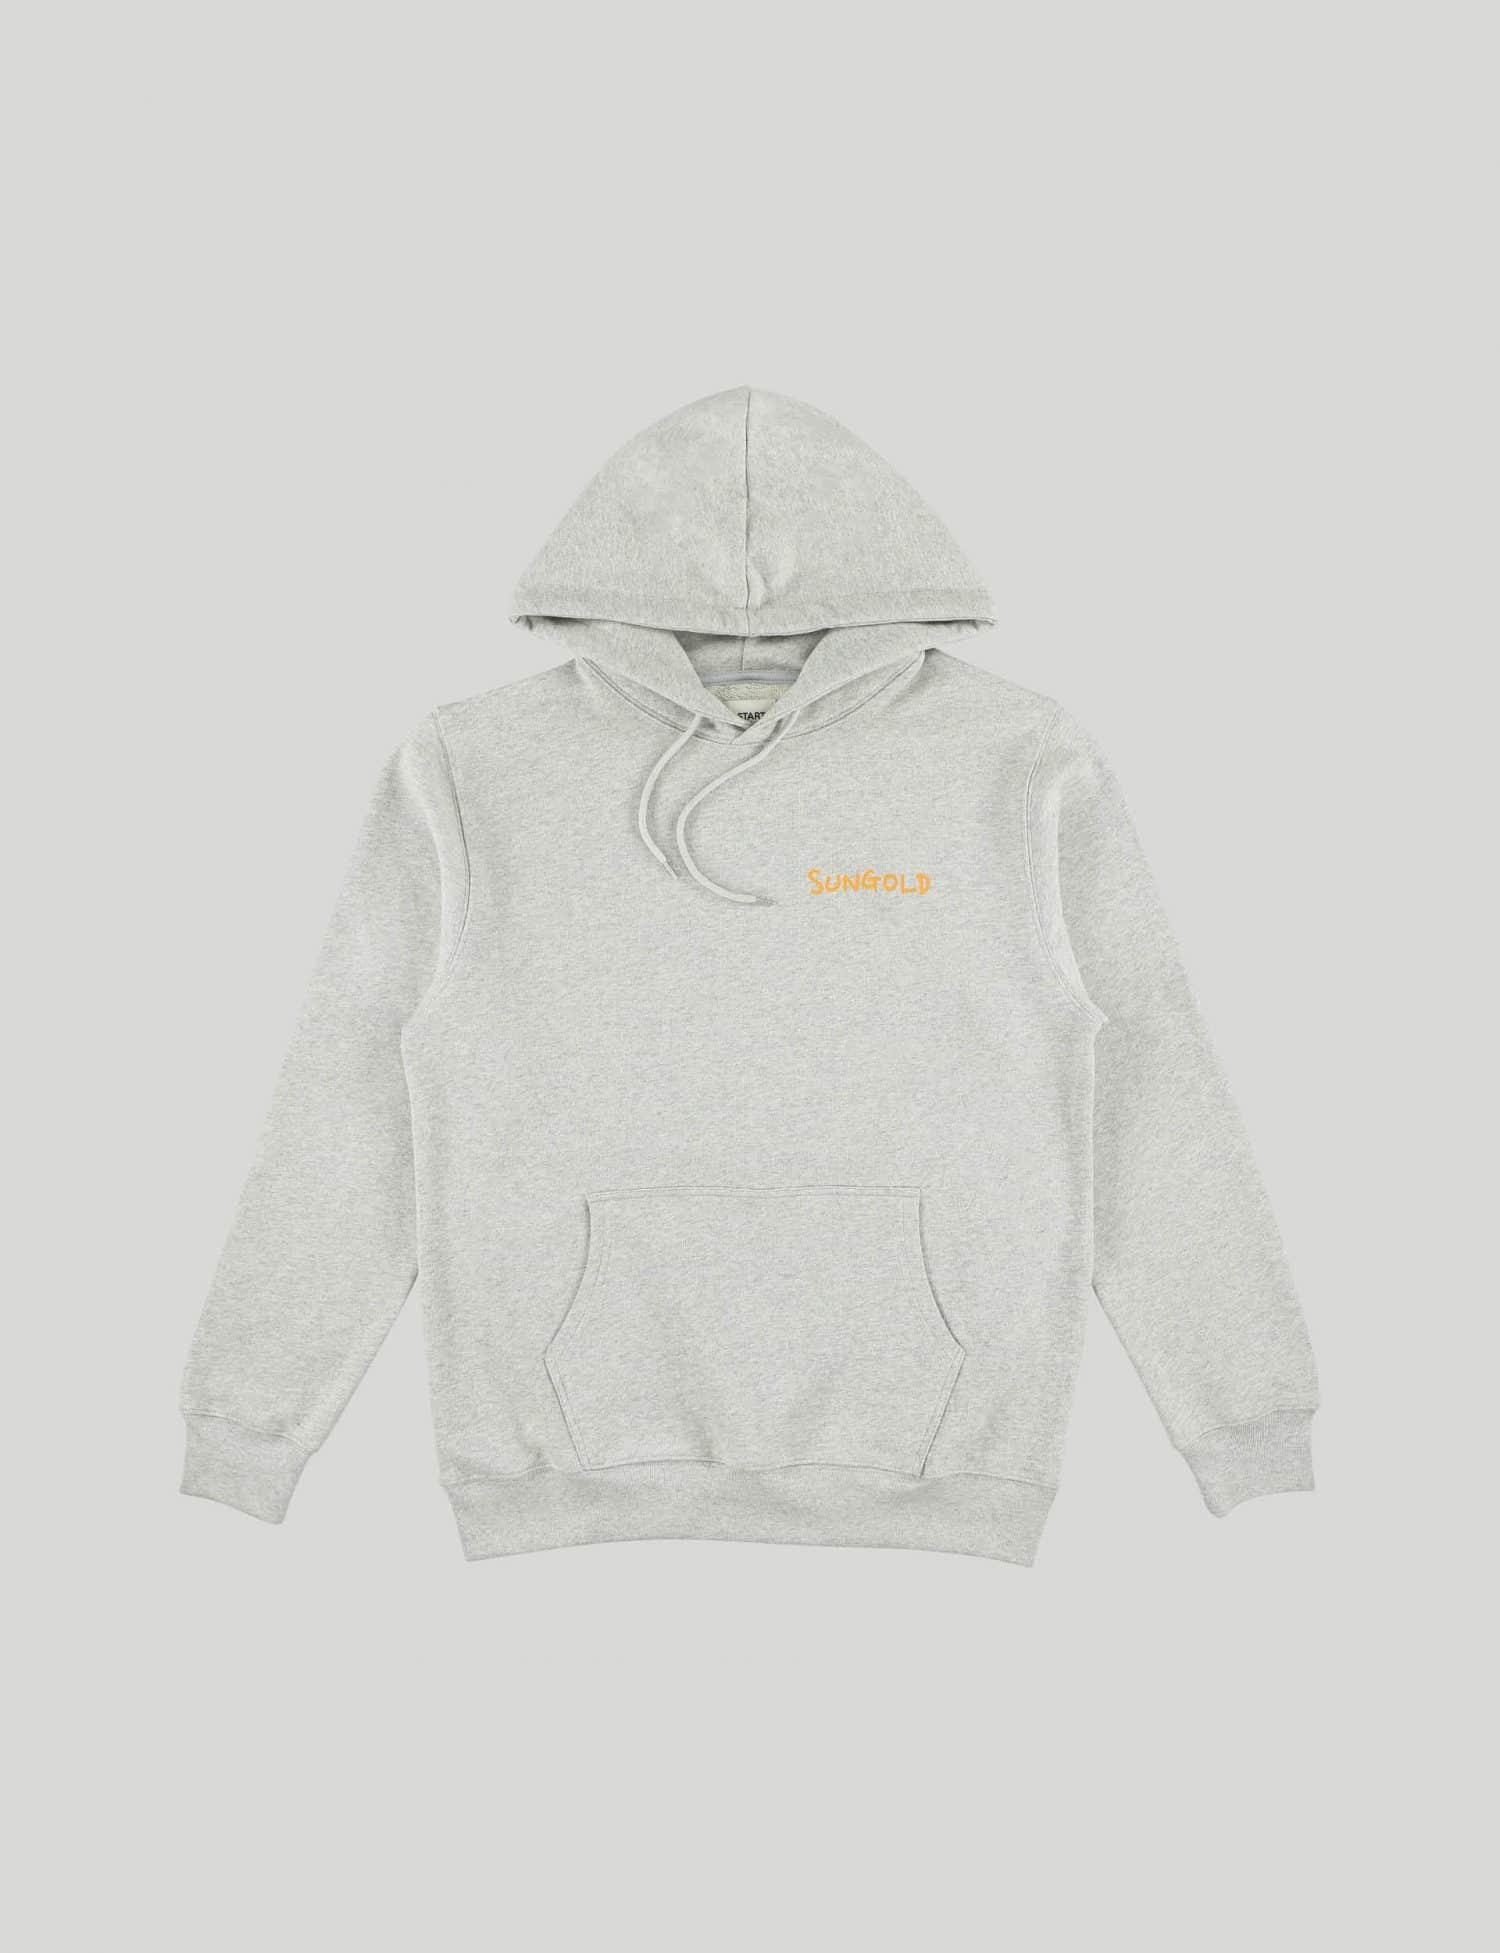 Castart - Medusa's hoodie - Middle Grey